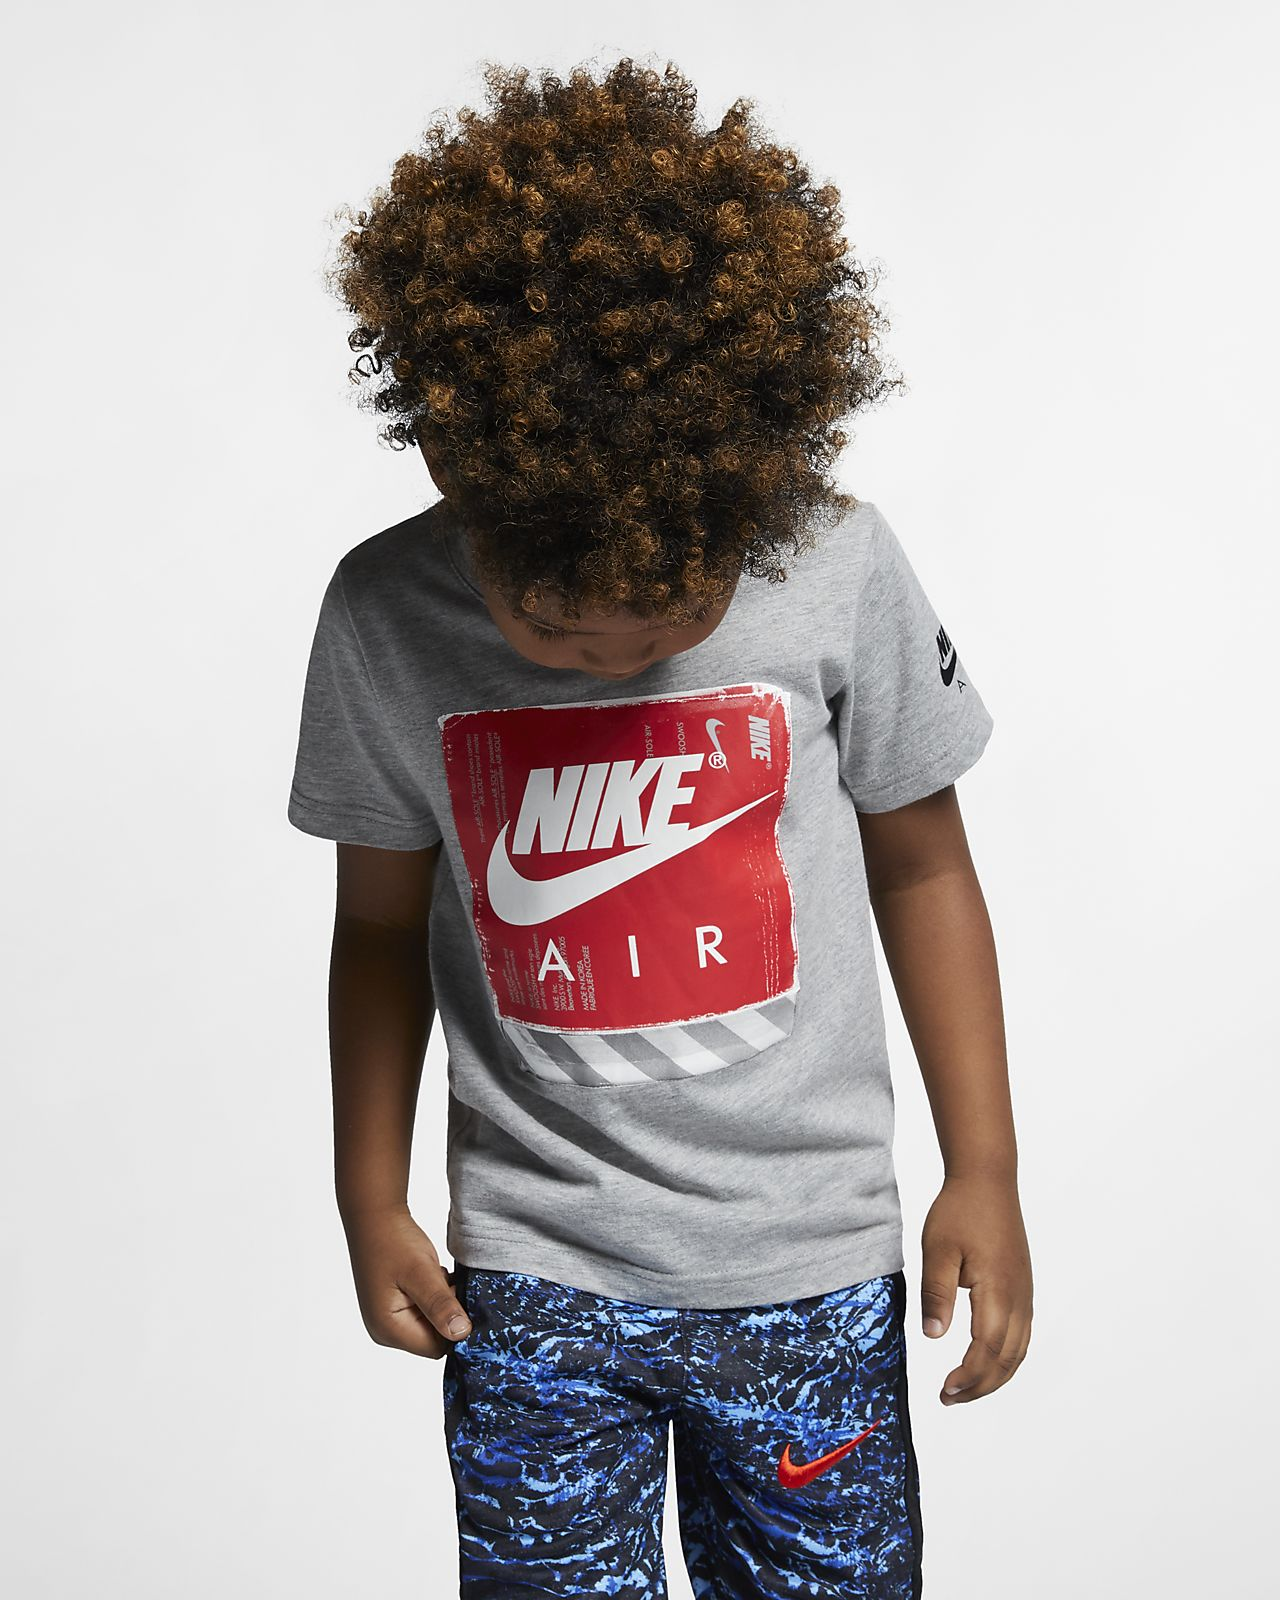 Nike Air T-Shirt für jüngere Kinder